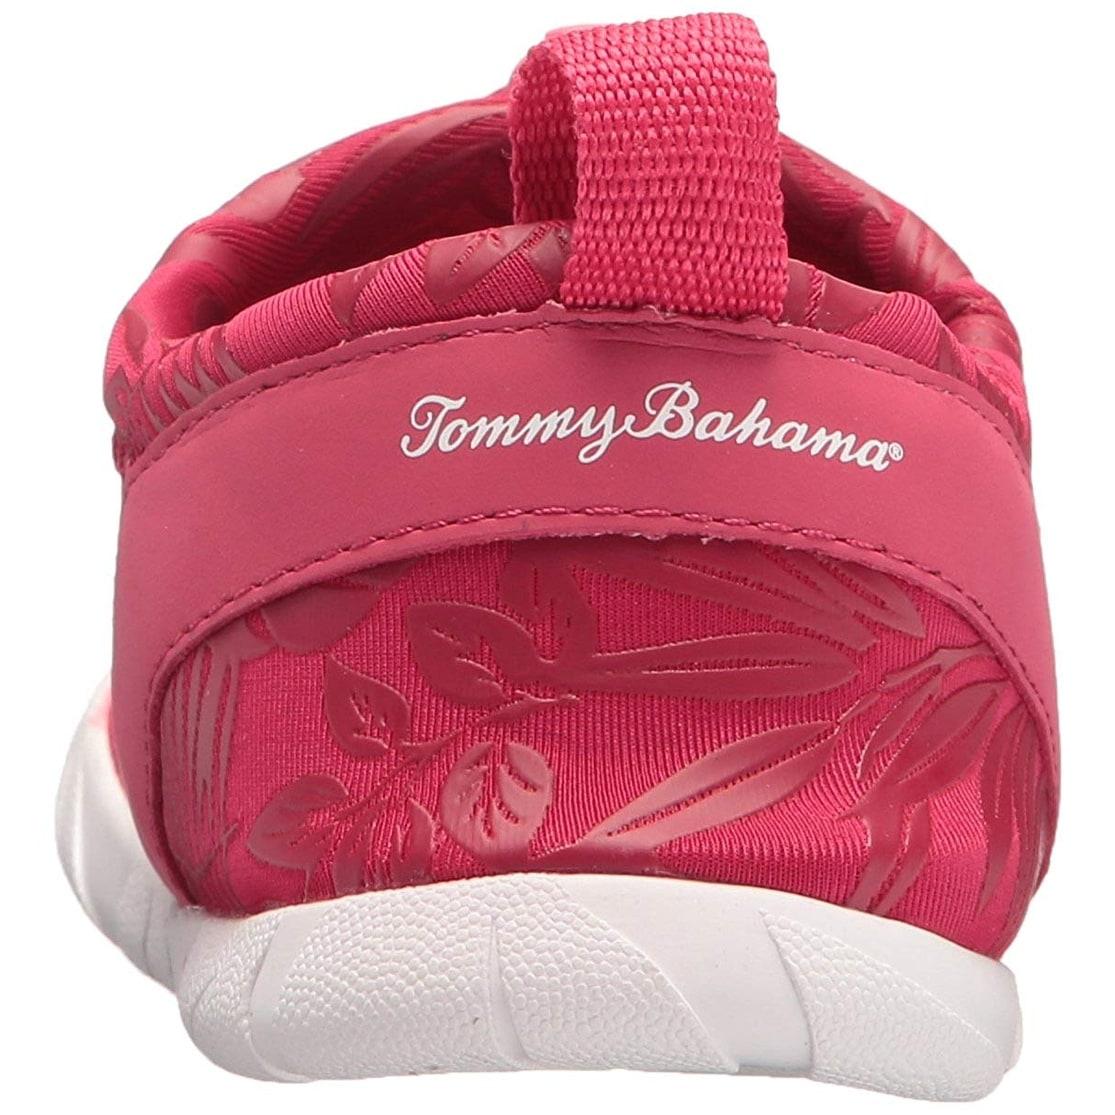 ab44a9b94855f Tommy Bahama Women's Komomo Island Water Shoe